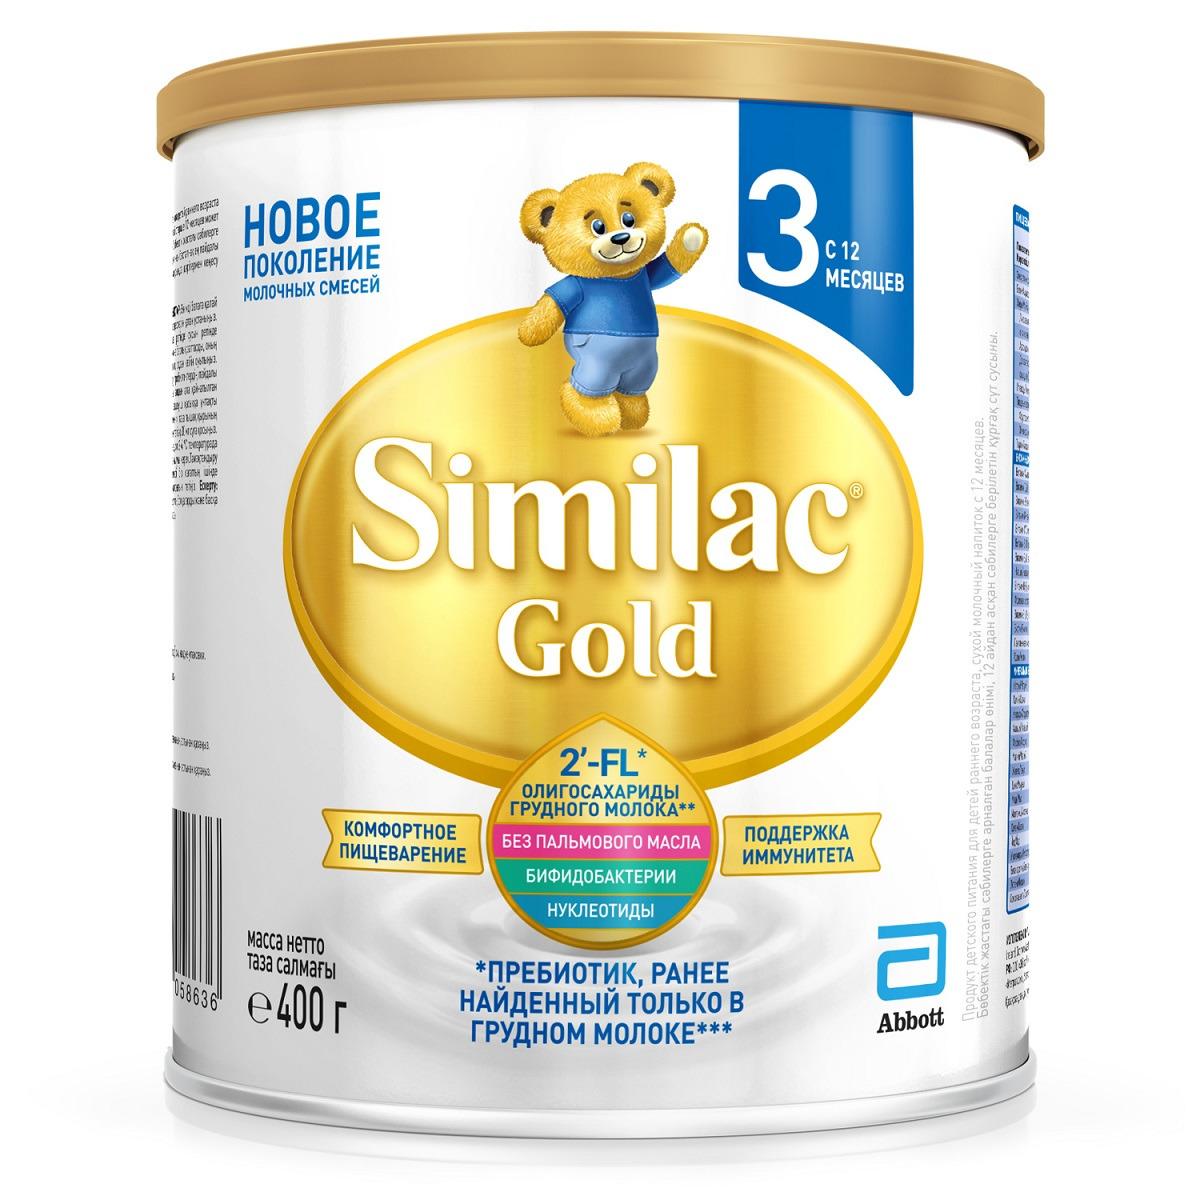 Фото - Детское молочко Similac Gold 3, с 12 месяцев, 400 г блок питания accord atx 1000w gold acc 1000w 80g 80 gold 24 8 4 4pin apfc 140mm fan 7xsata rtl